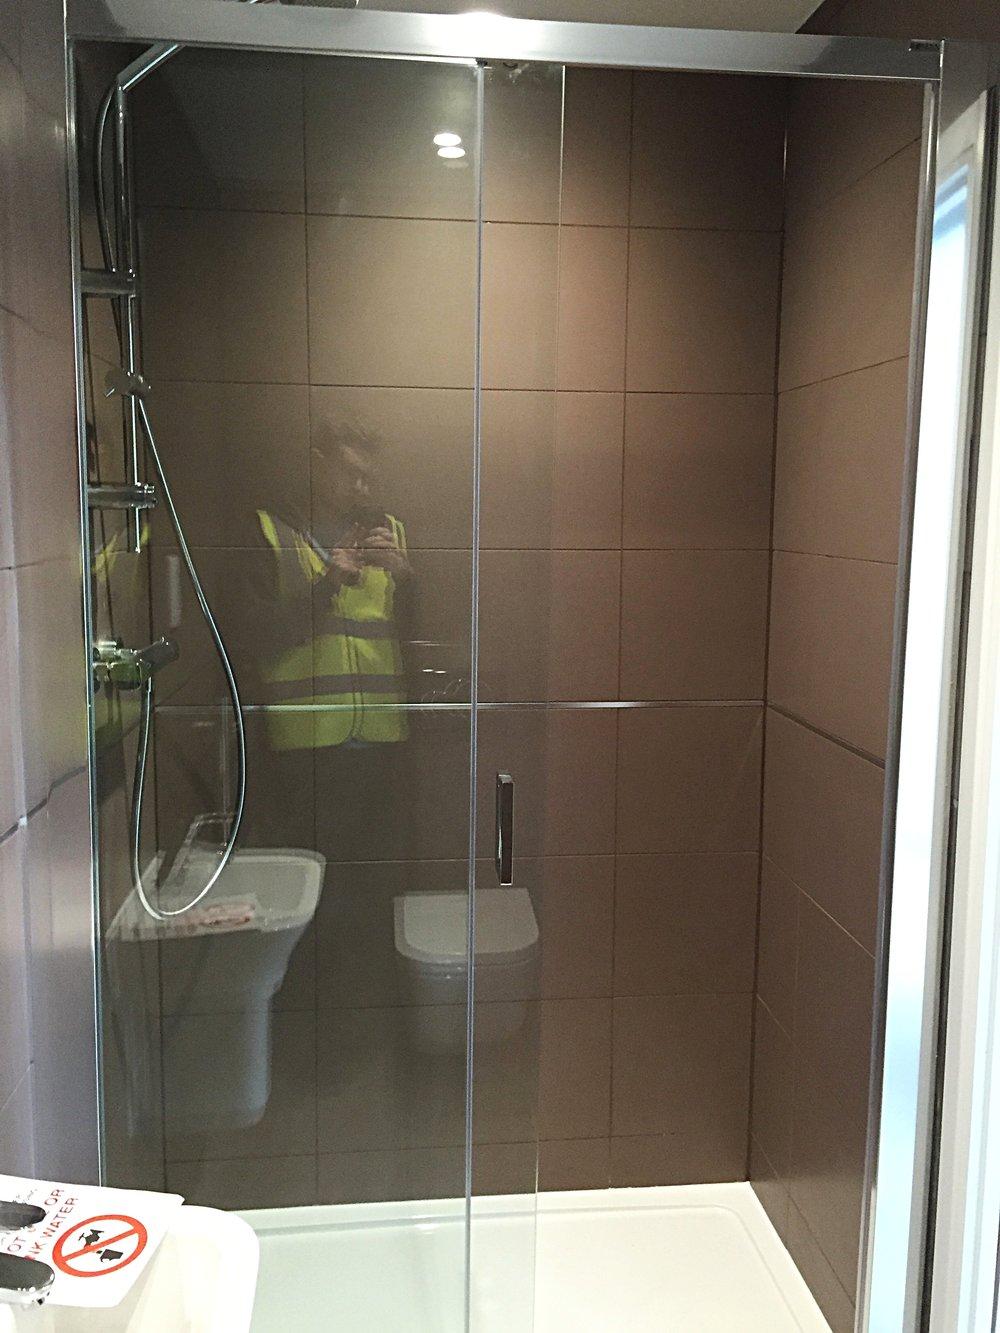 Ensuite-Shower-Toilet-basin-Bristol.jpg